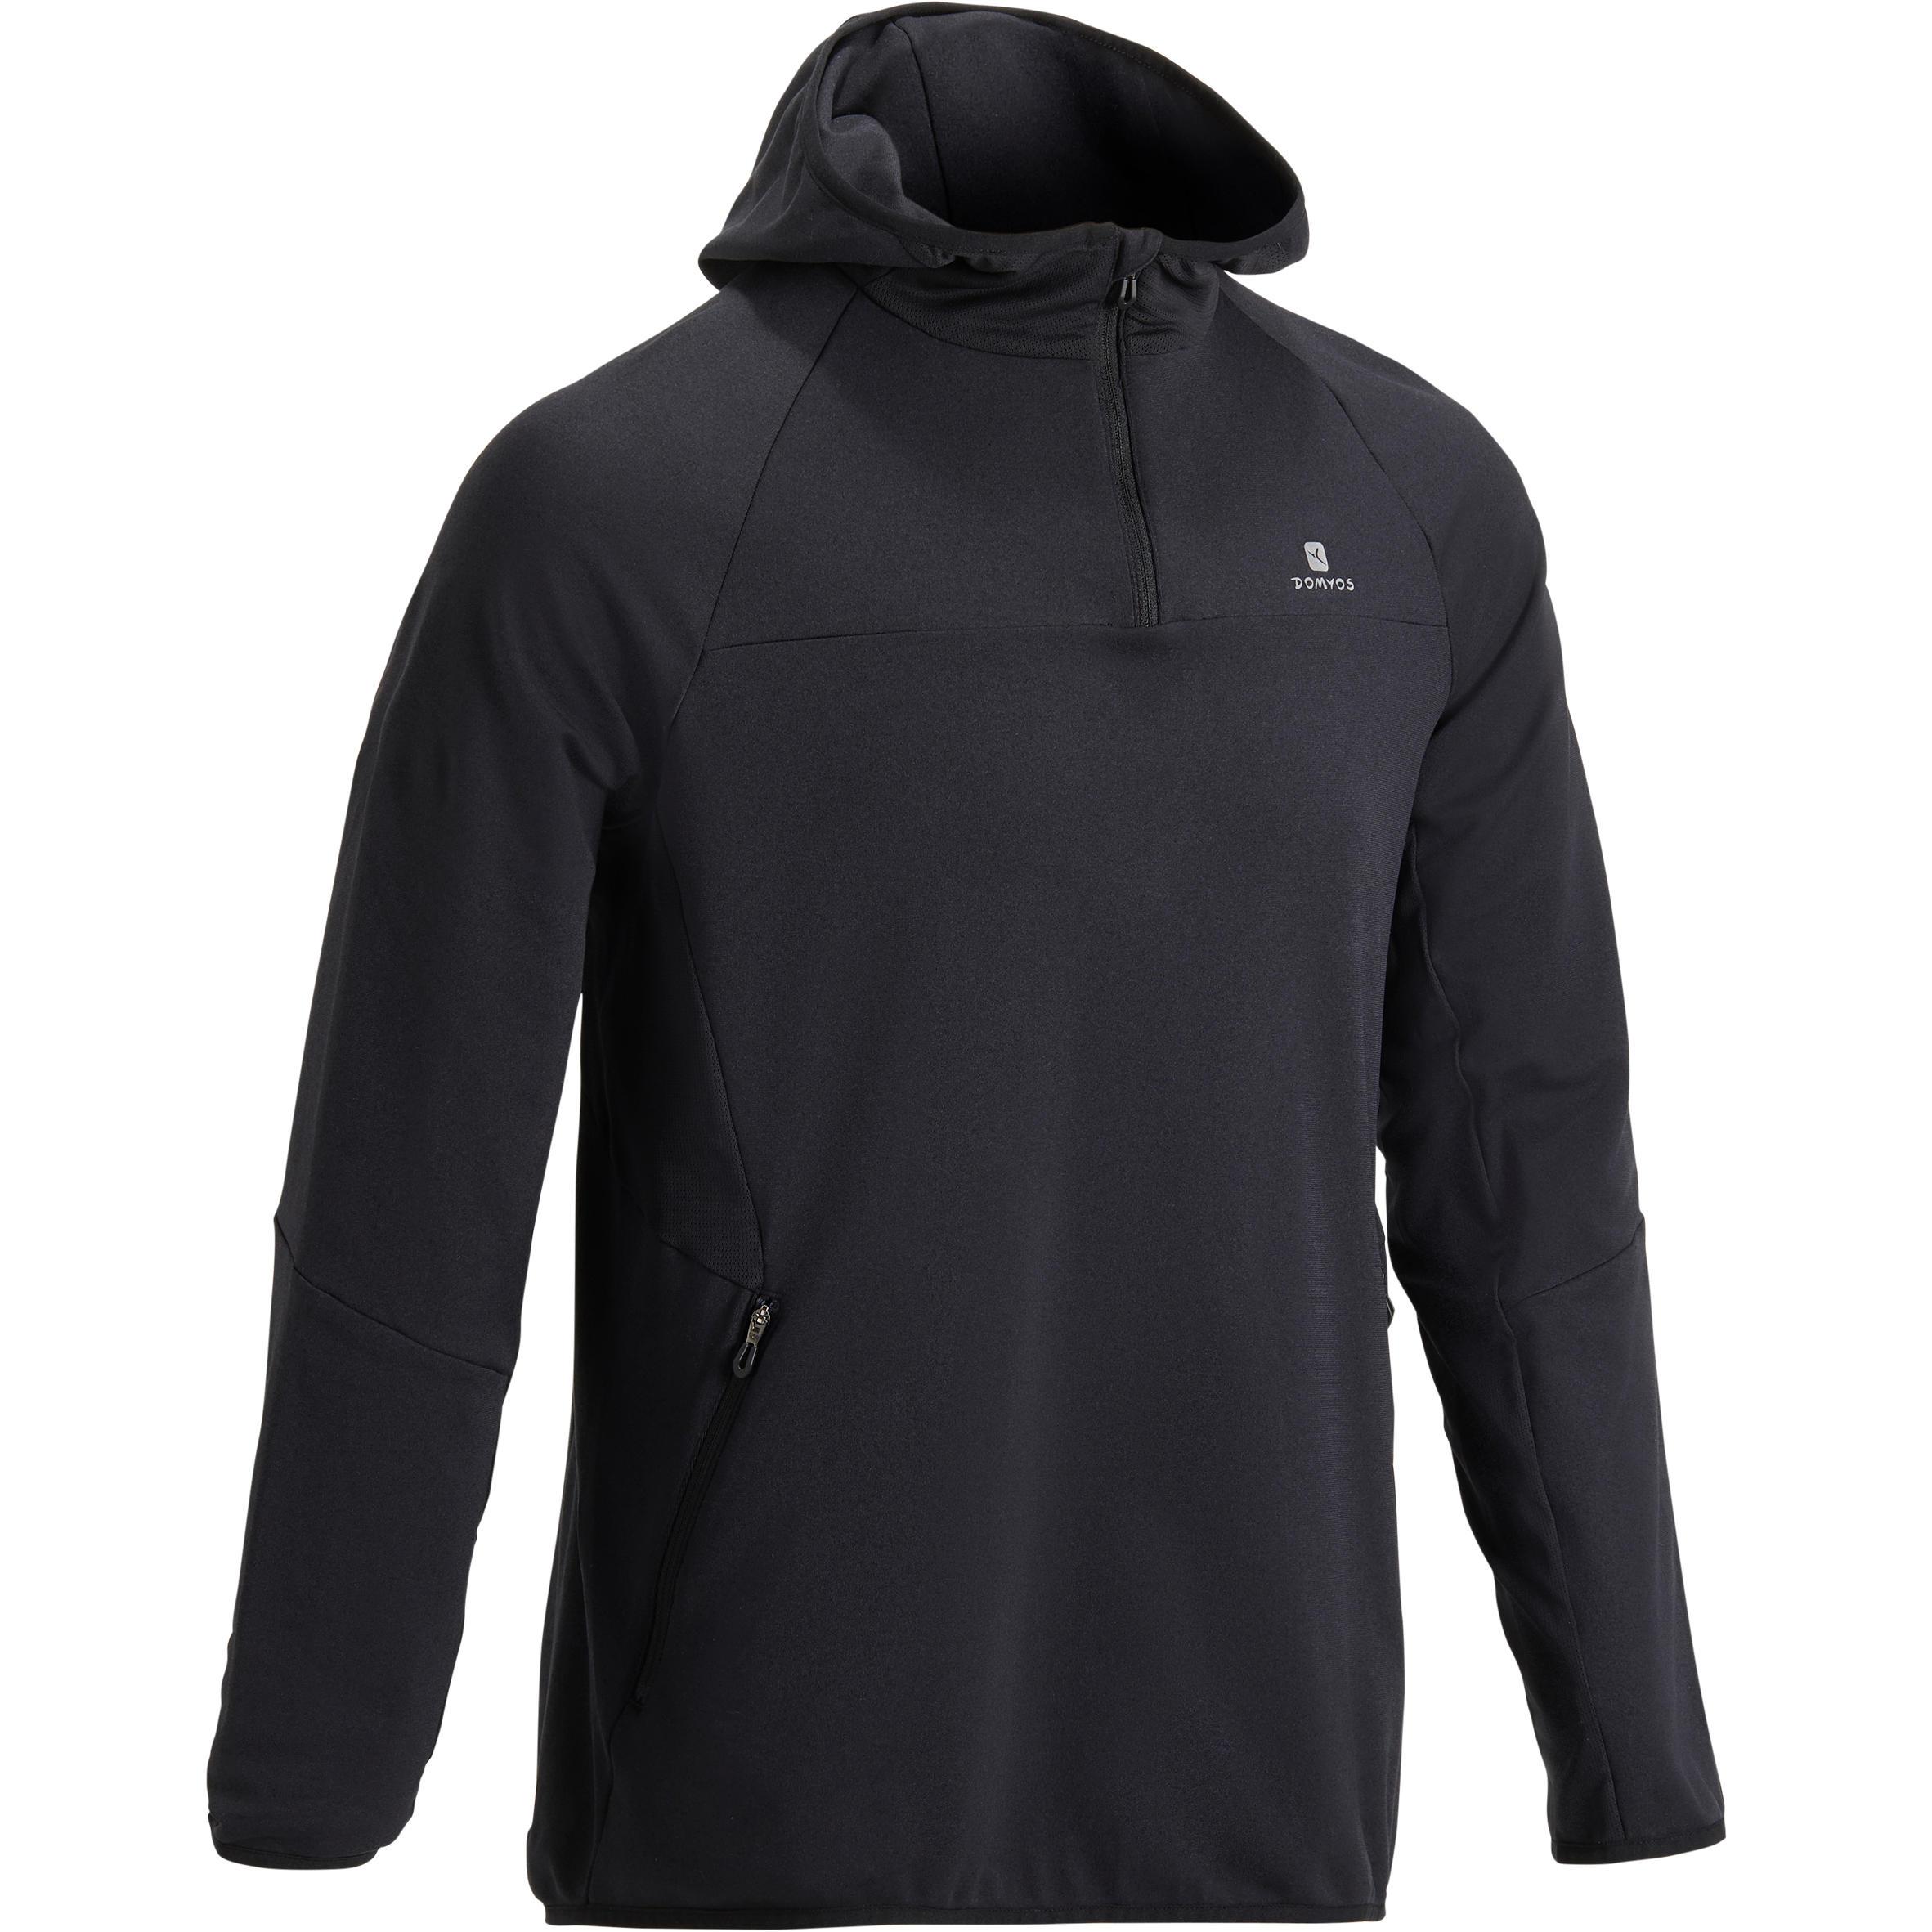 Domyos Sweater fitness-cardio FSW500 heren zwart